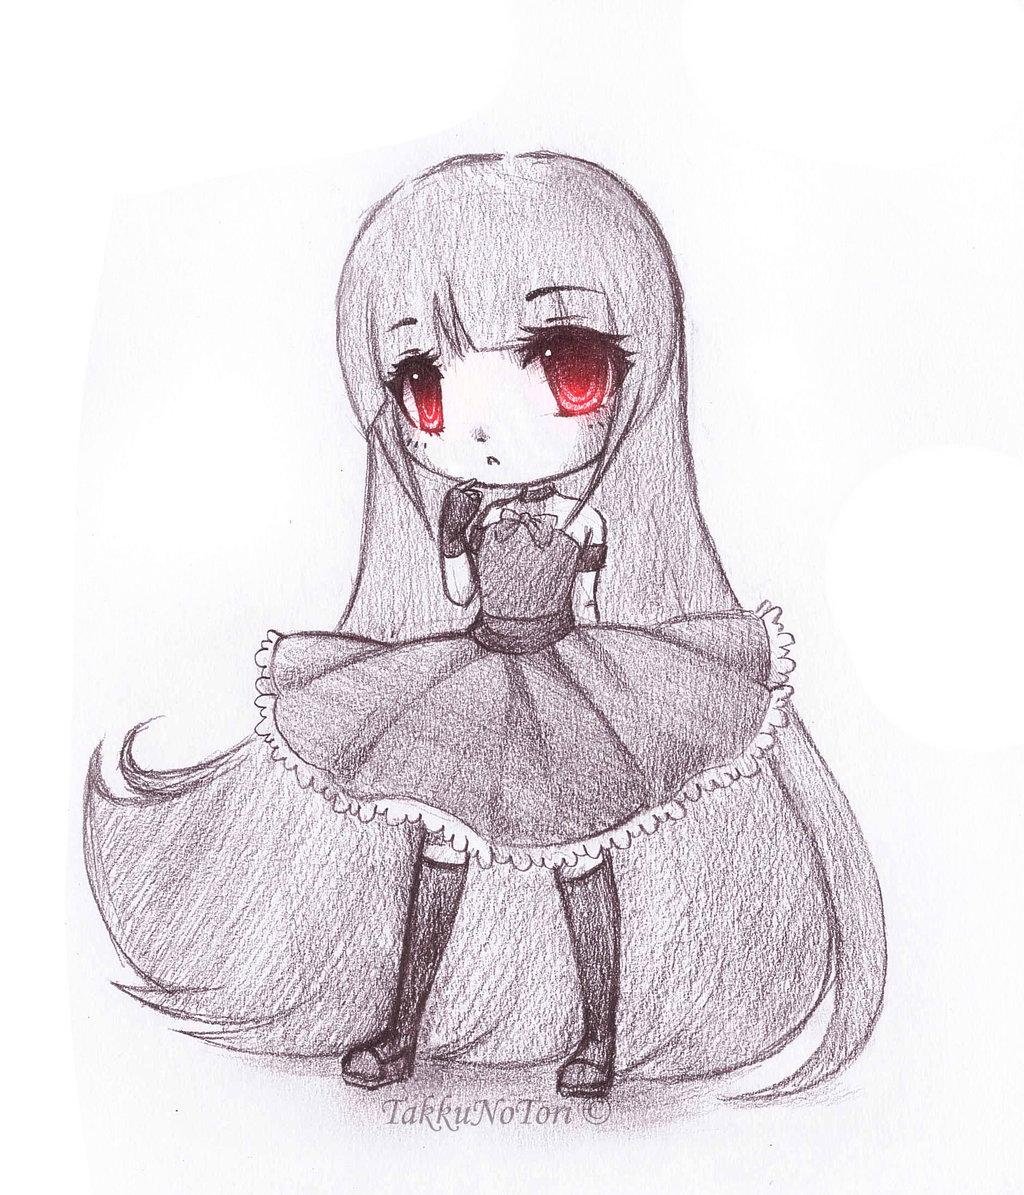 Cute Chibi Anime Drawings Pencil Art Drawing Card From User